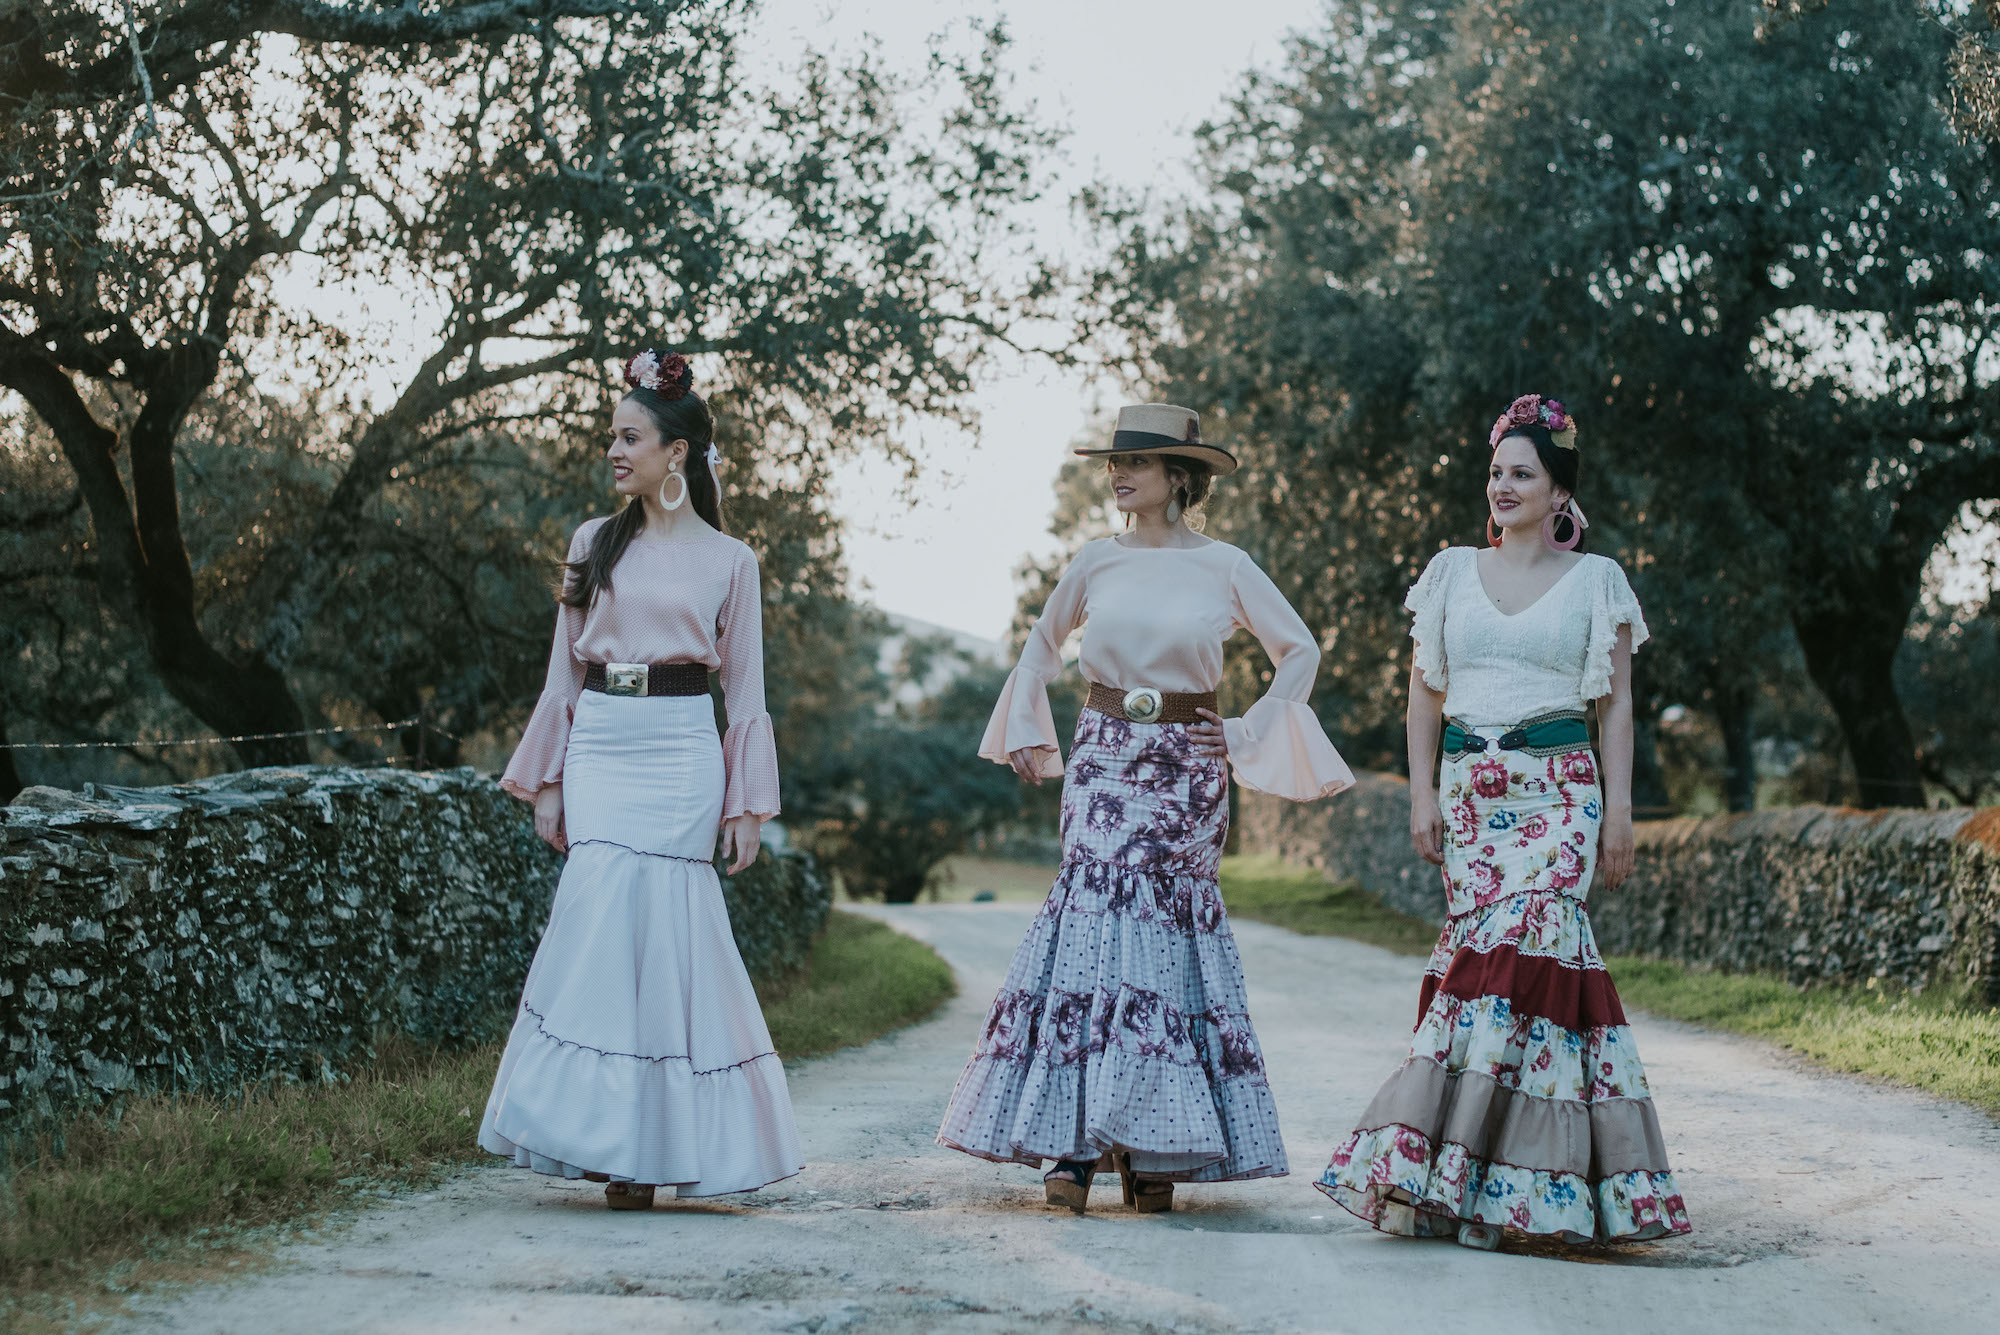 Isabel_hernandez_faldas_flamencas-FF20-161